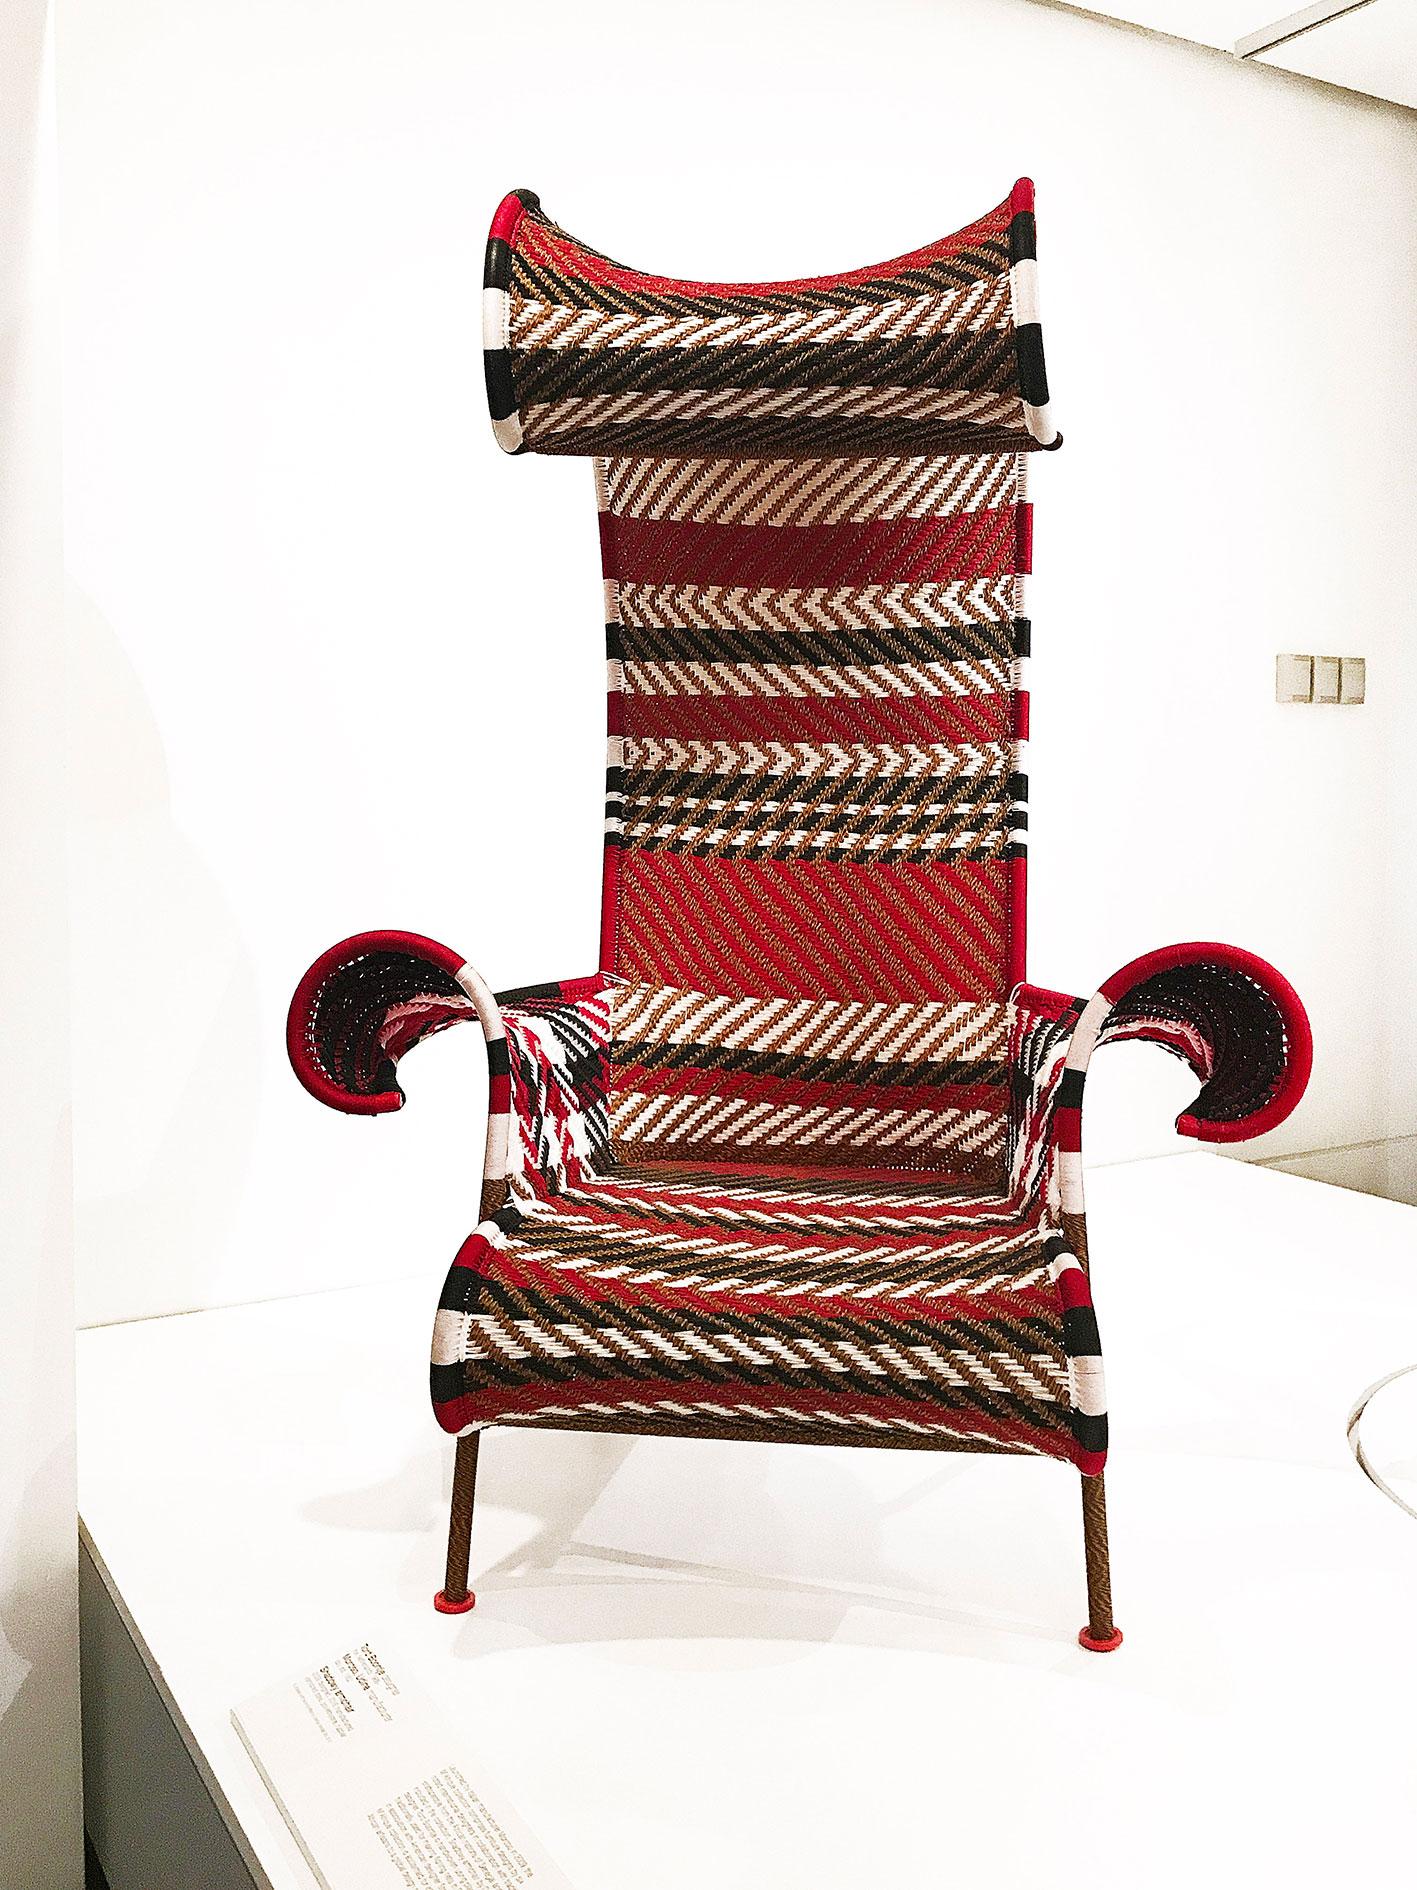 Melbartdiary_Chair-14.jpg